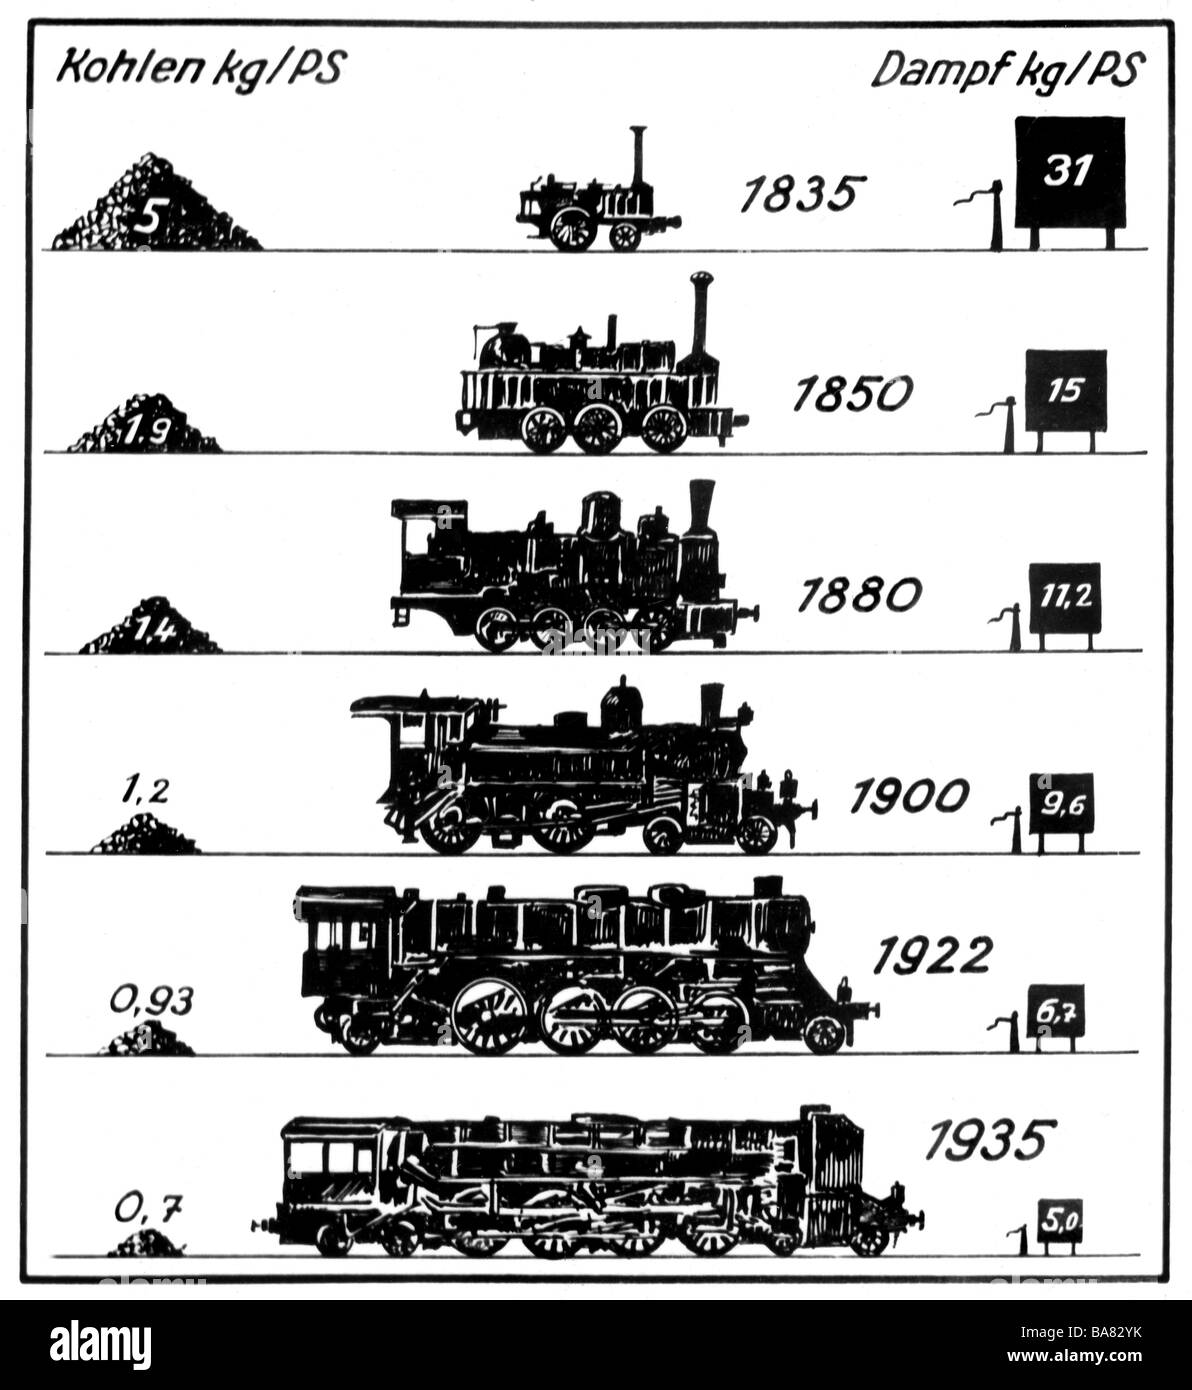 hight resolution of transport transportation railway locomotives steam locomotive diagram consumtion of coal kg ps in relation to steam kg ps deutsche reichsbahn public